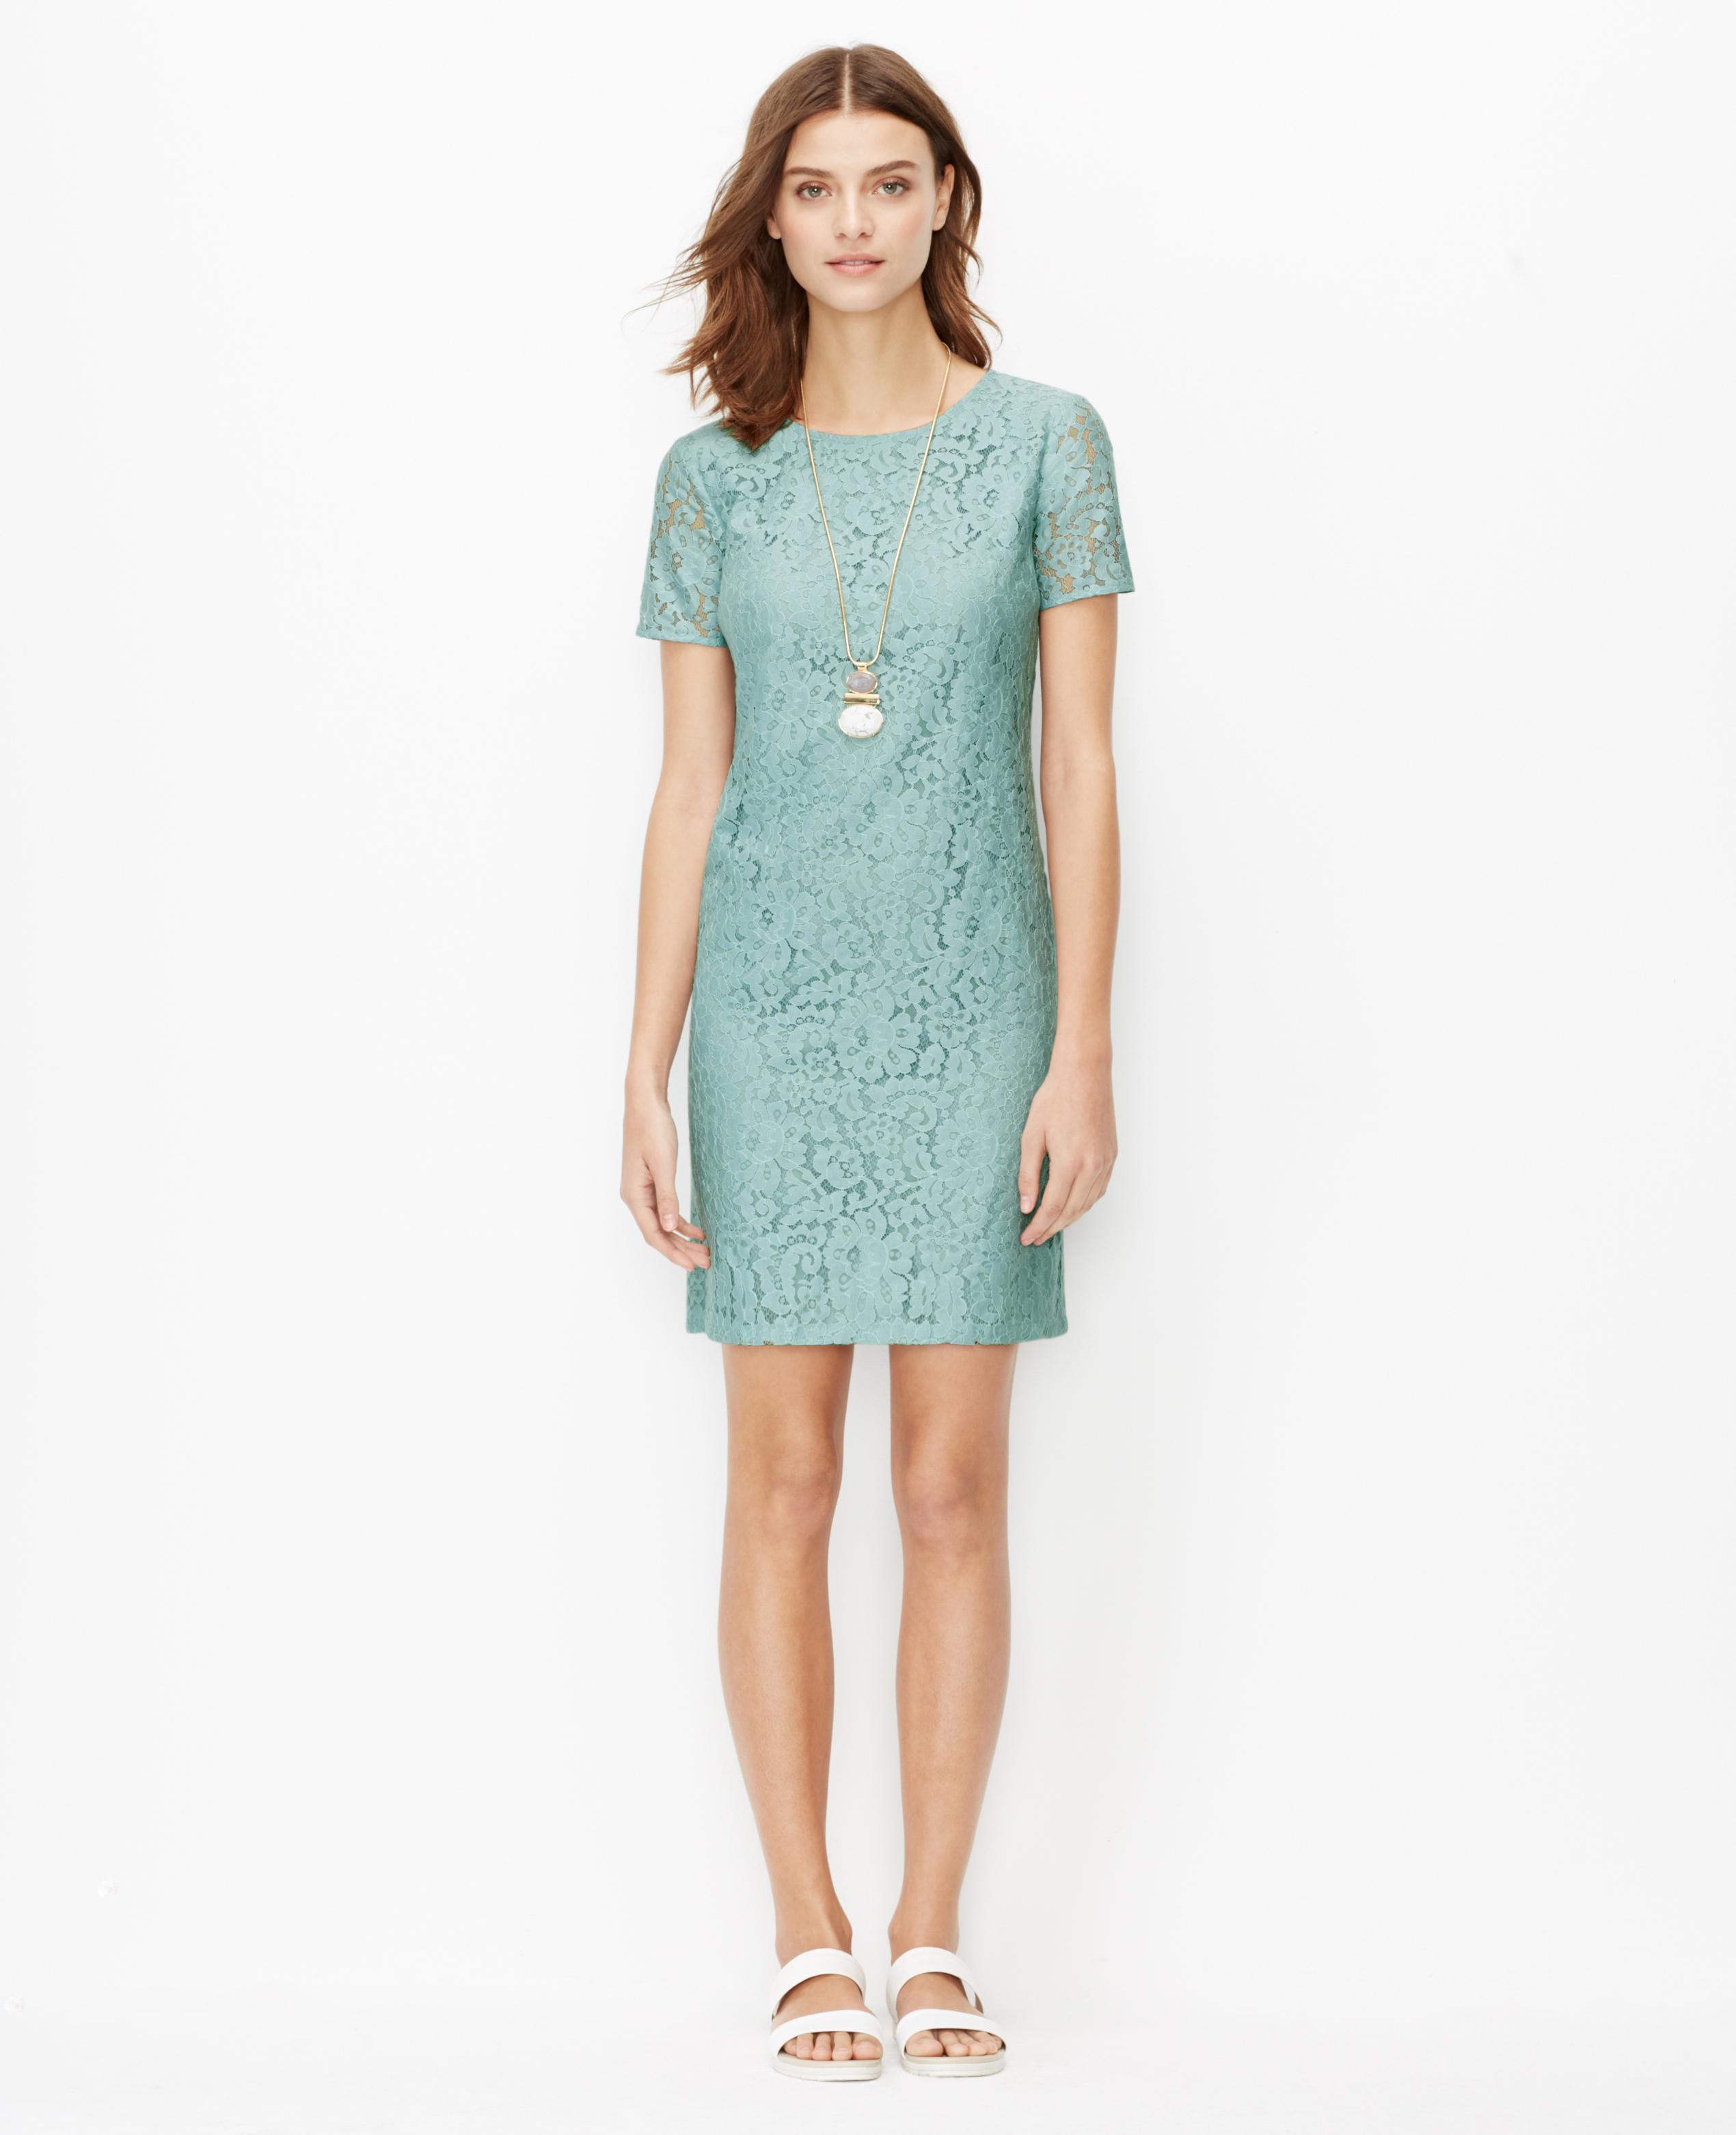 Ann Taylor Petite Lace Shift Dress In Blue